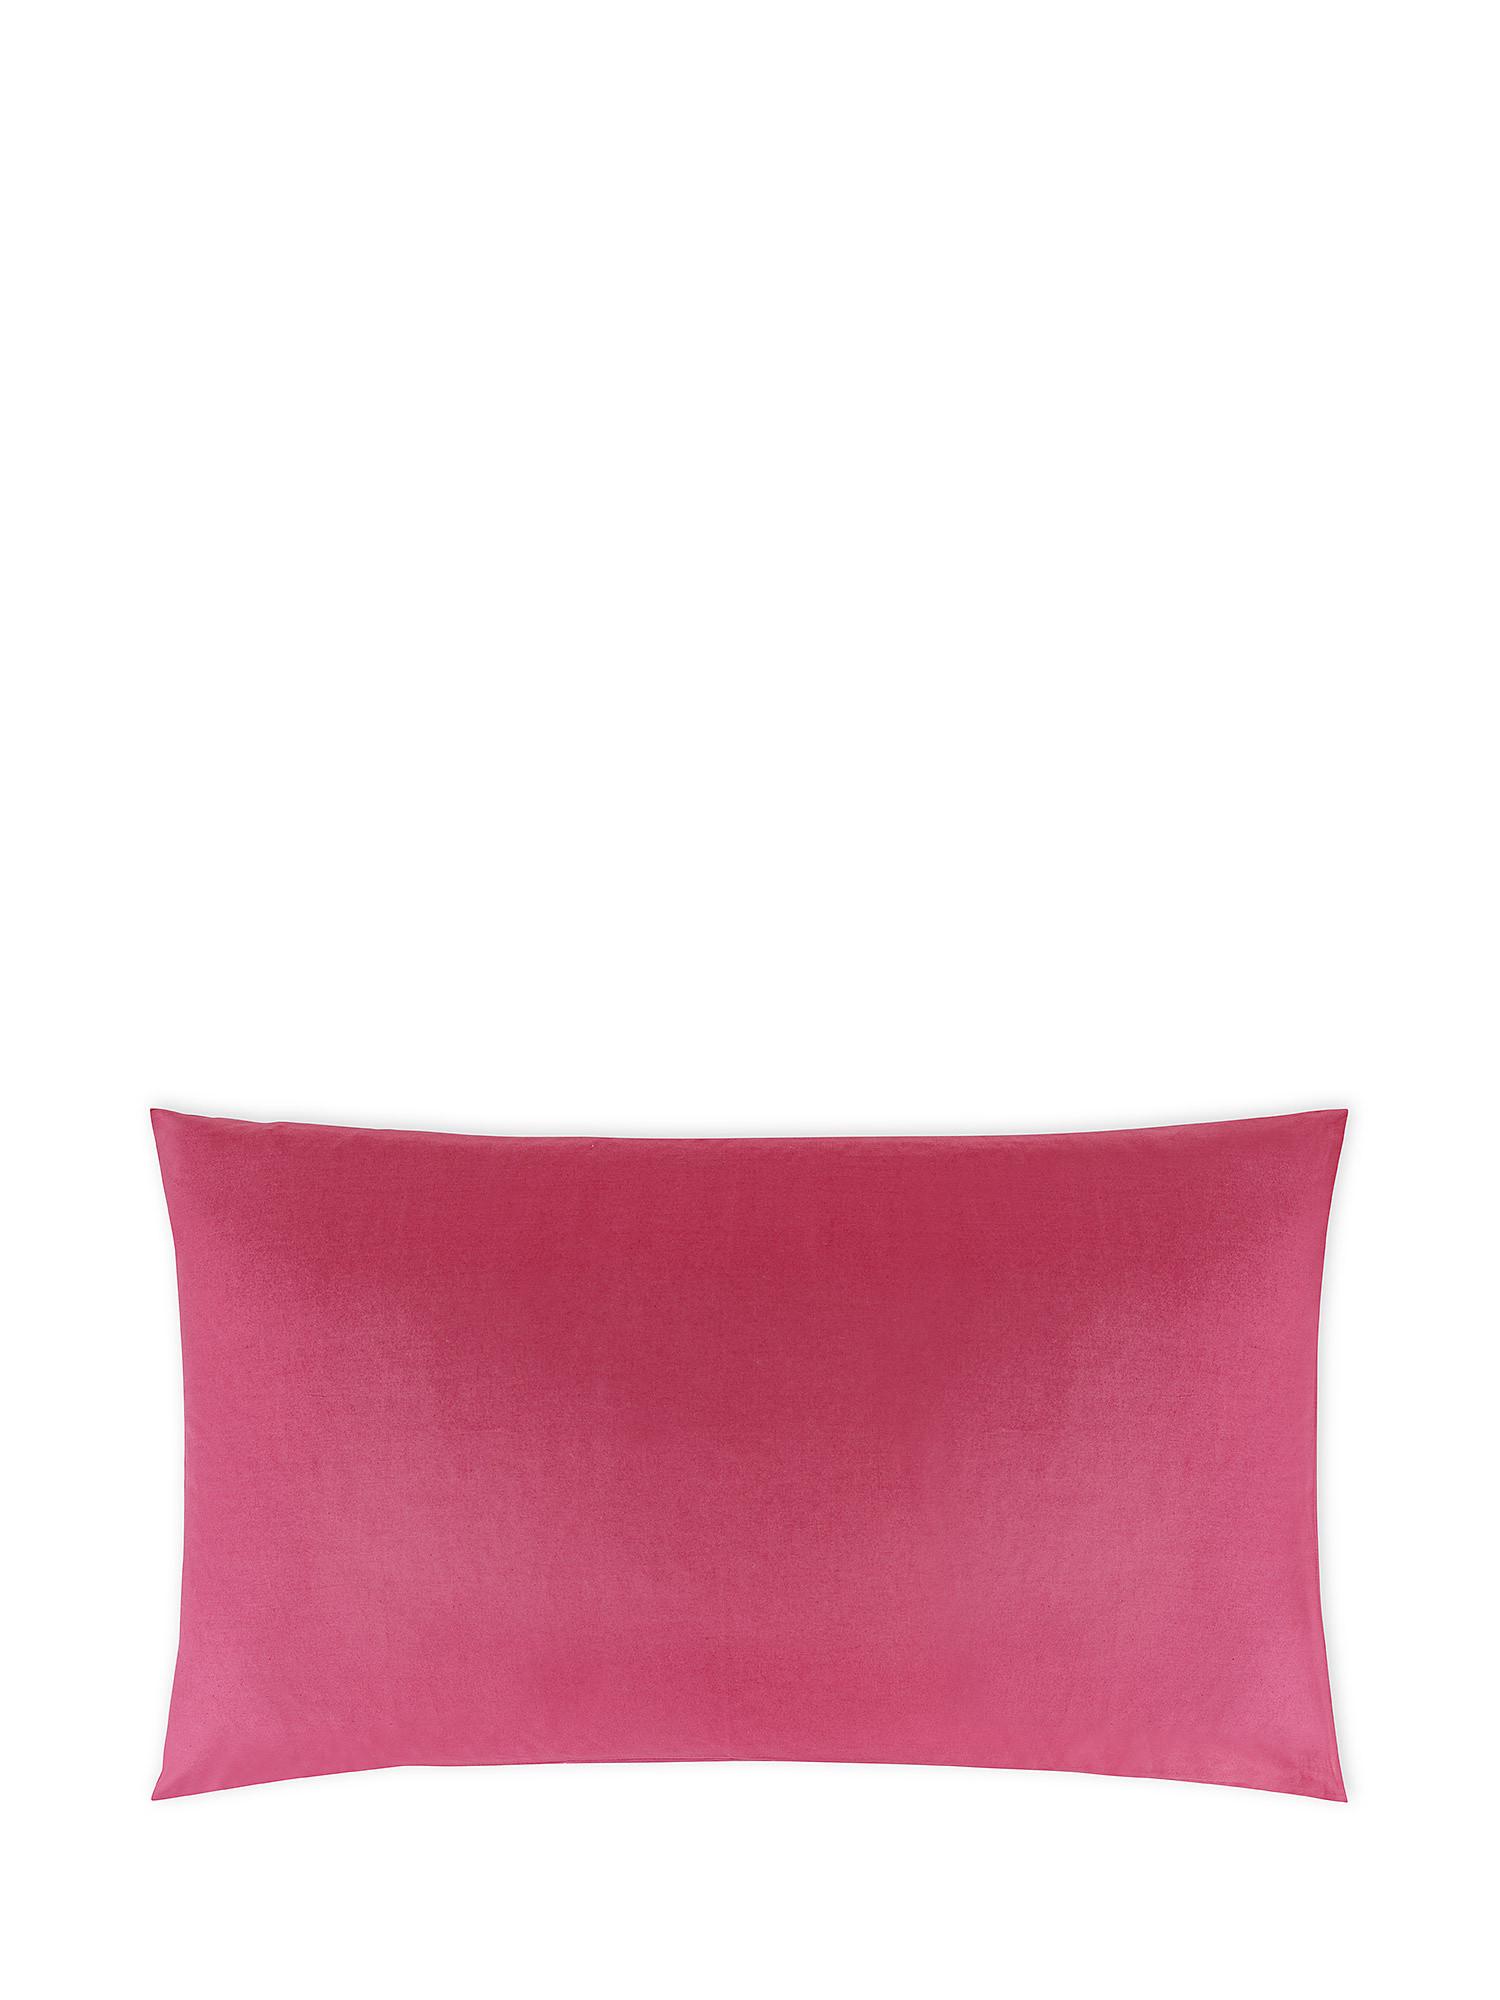 Federa puro cotone tinta unita, Rosa scuro, large image number 0